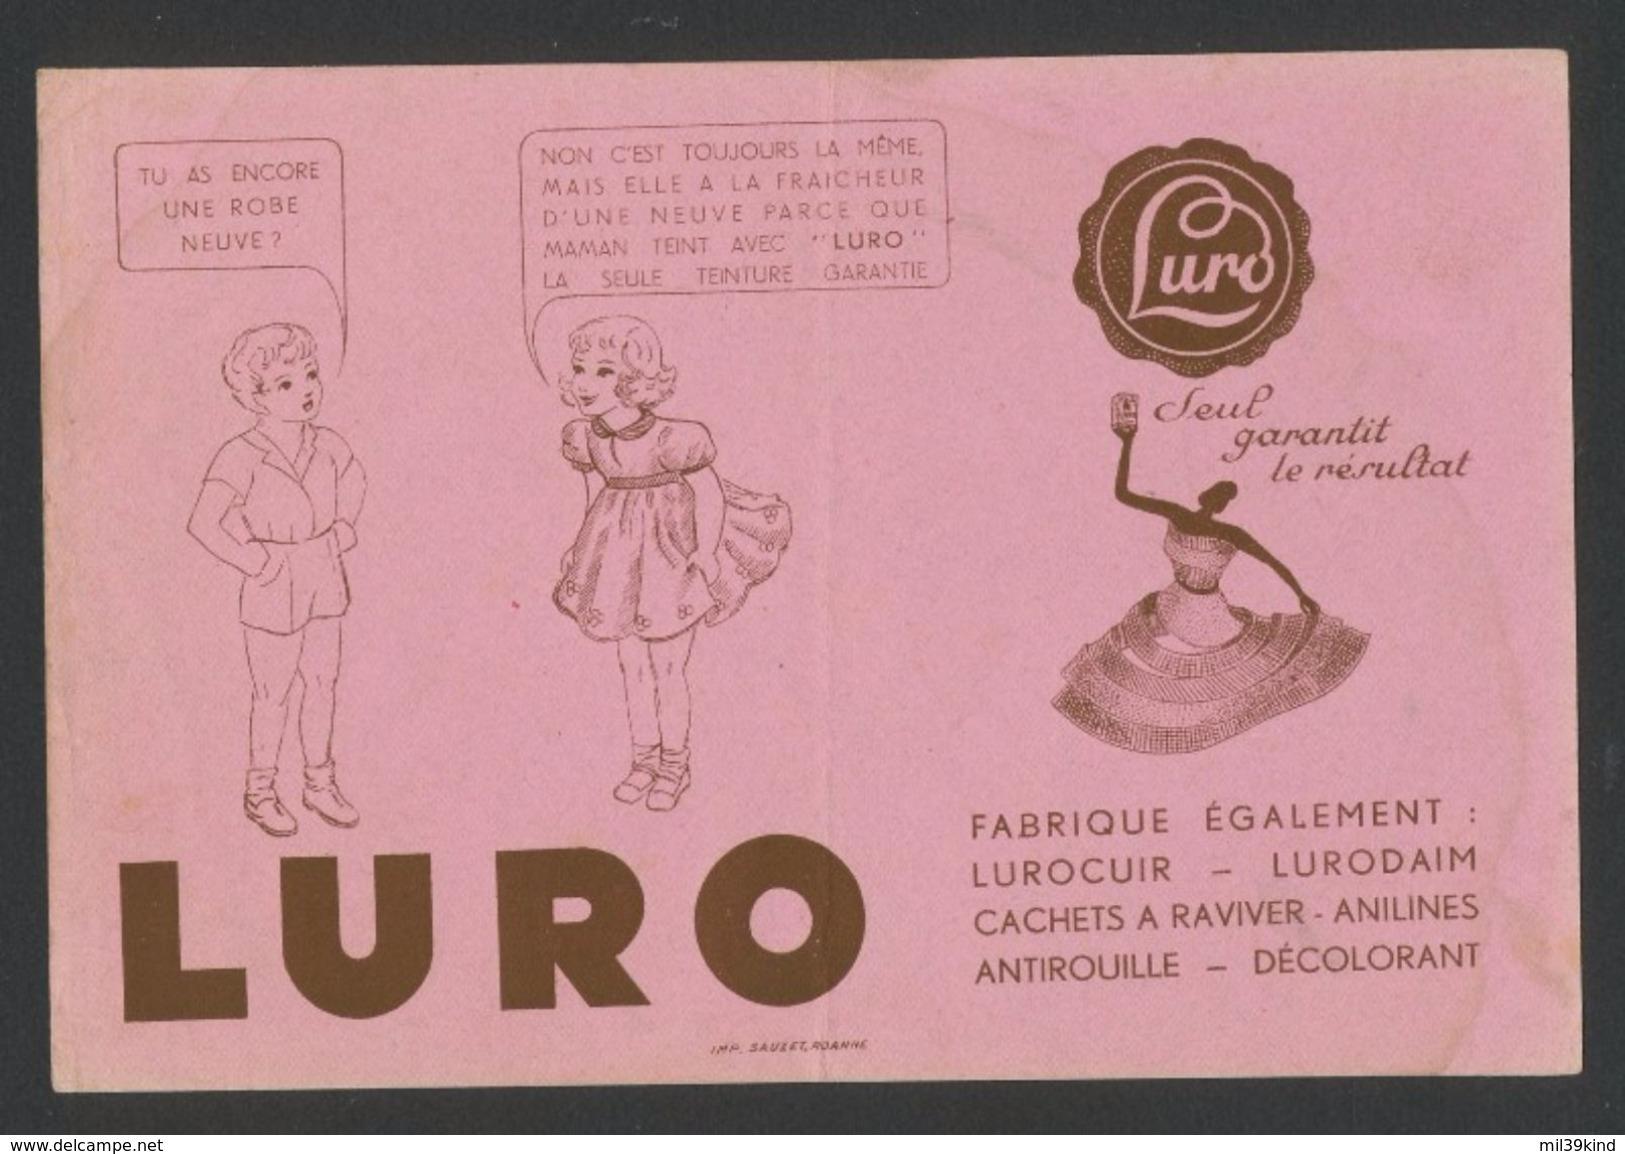 Buvard - Détachanr Ravivant - LURO - L